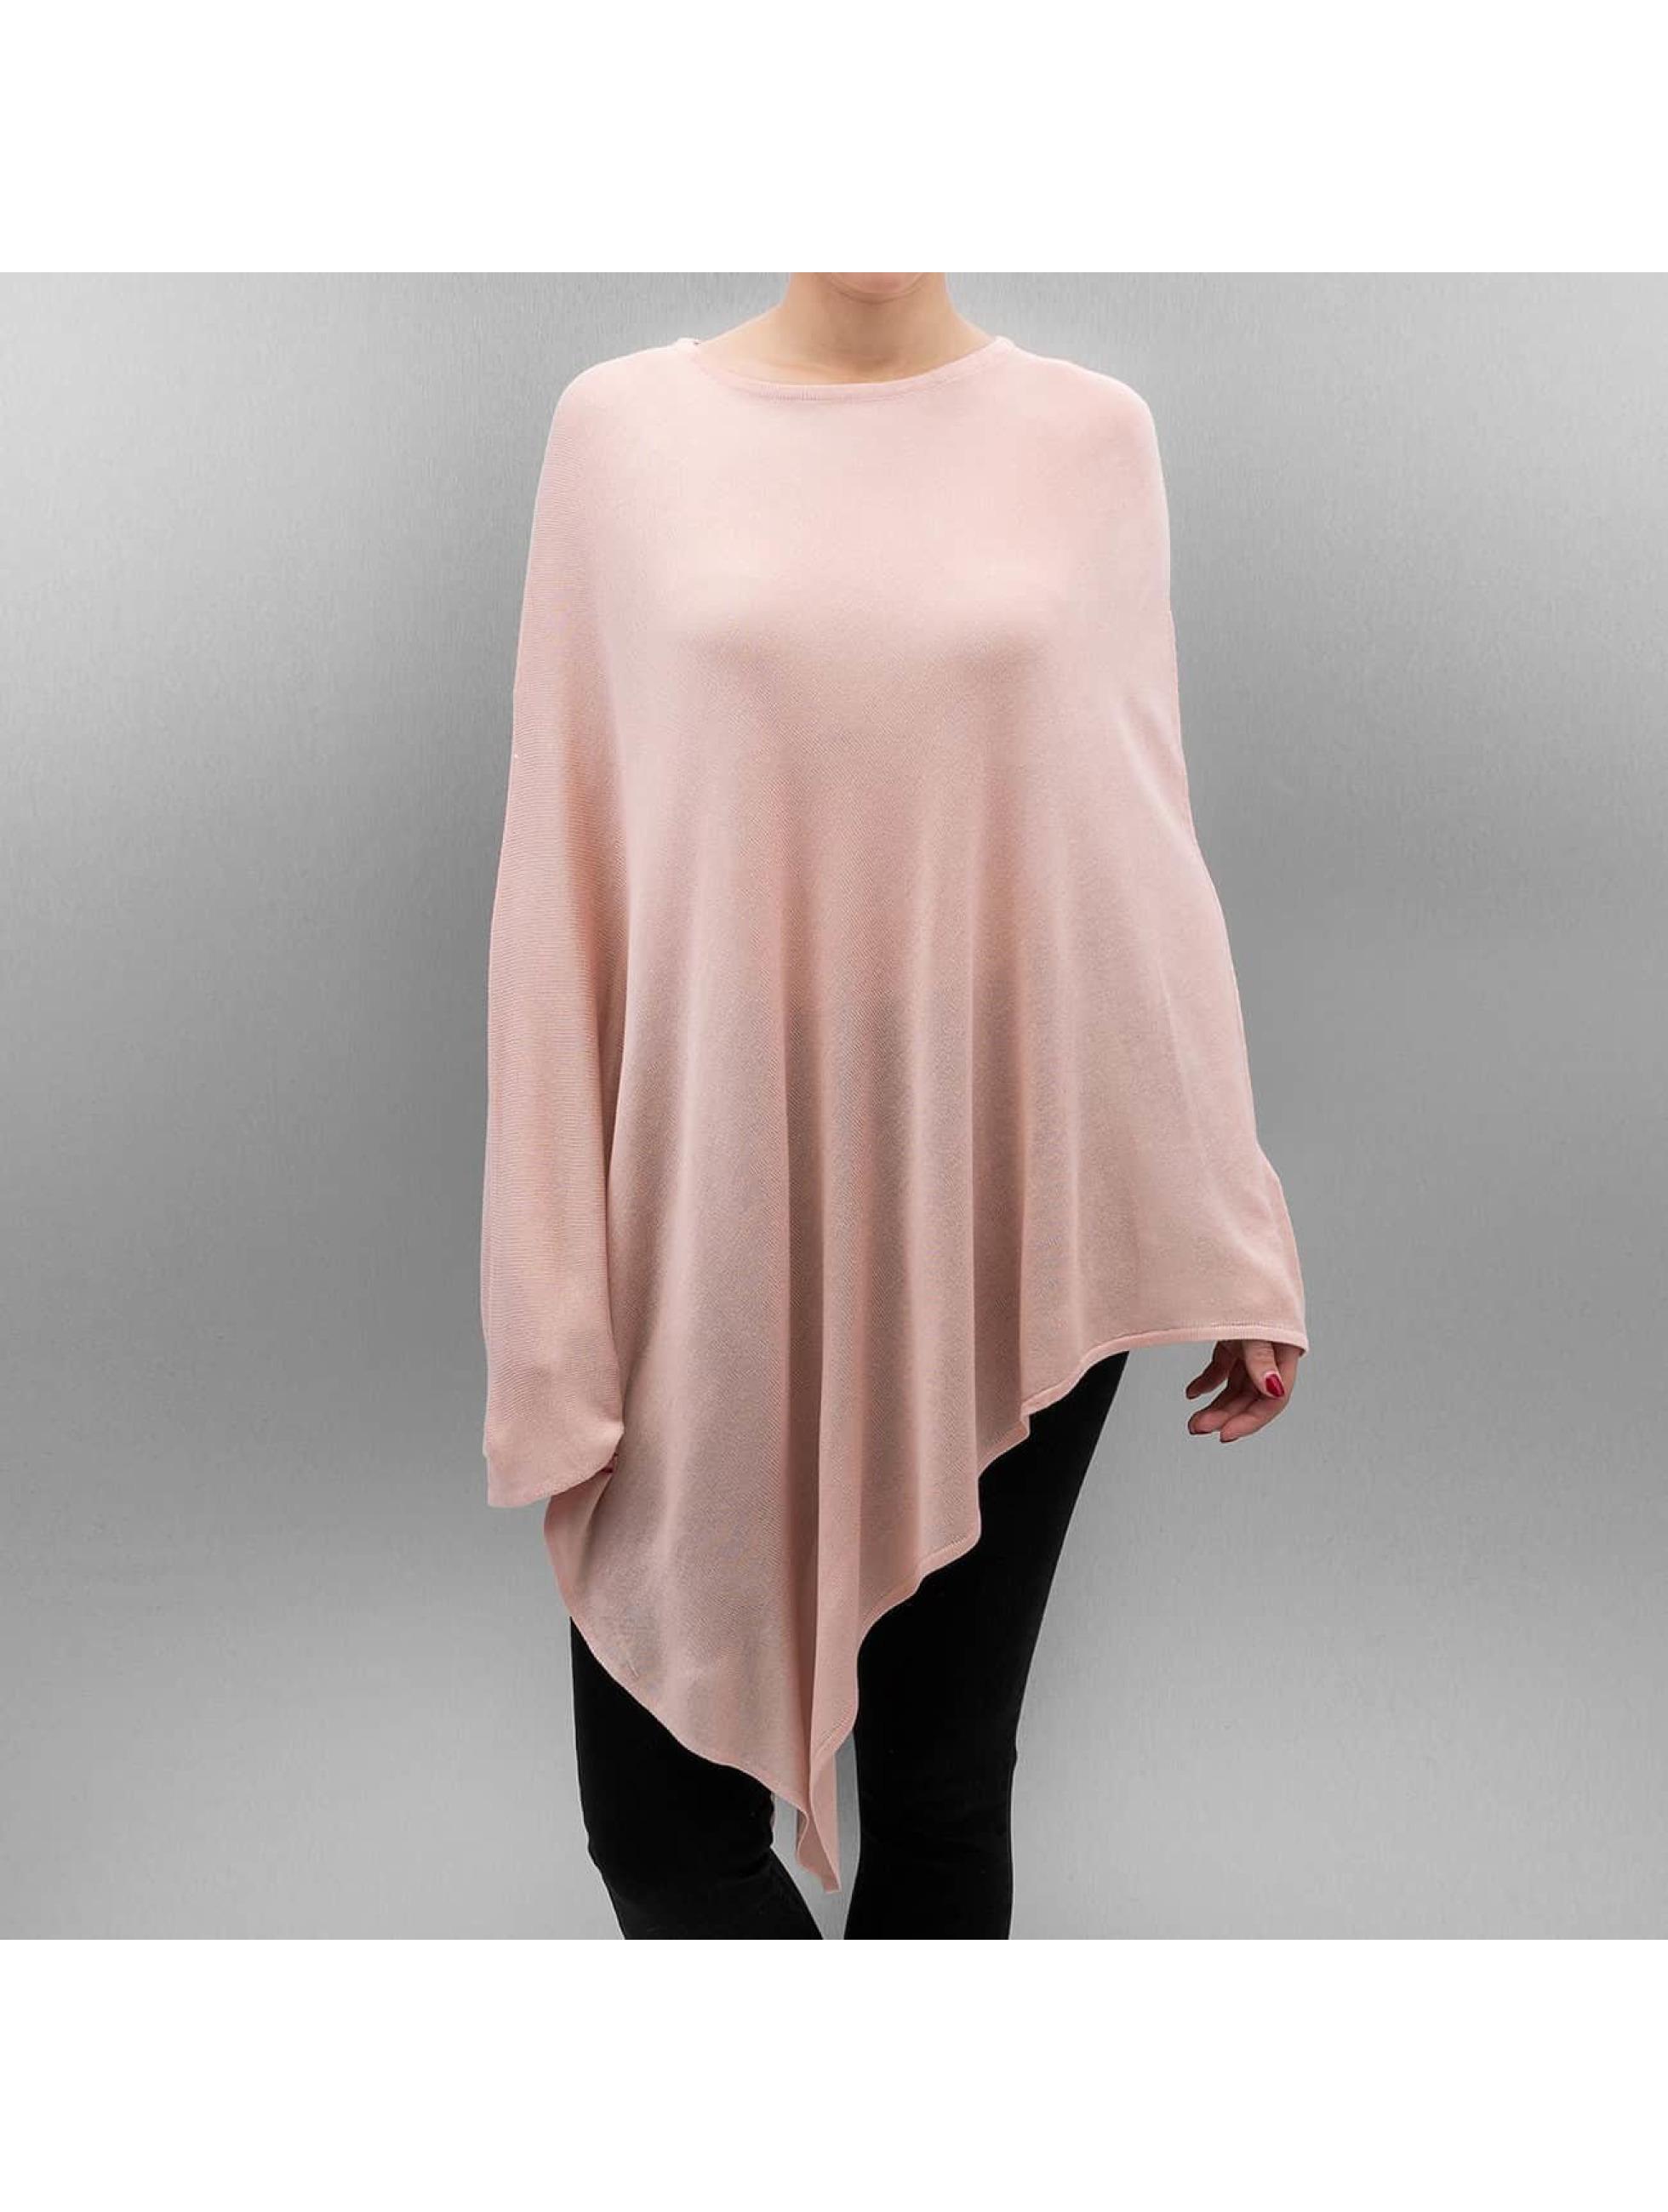 Pullover PcTrikki in rosa